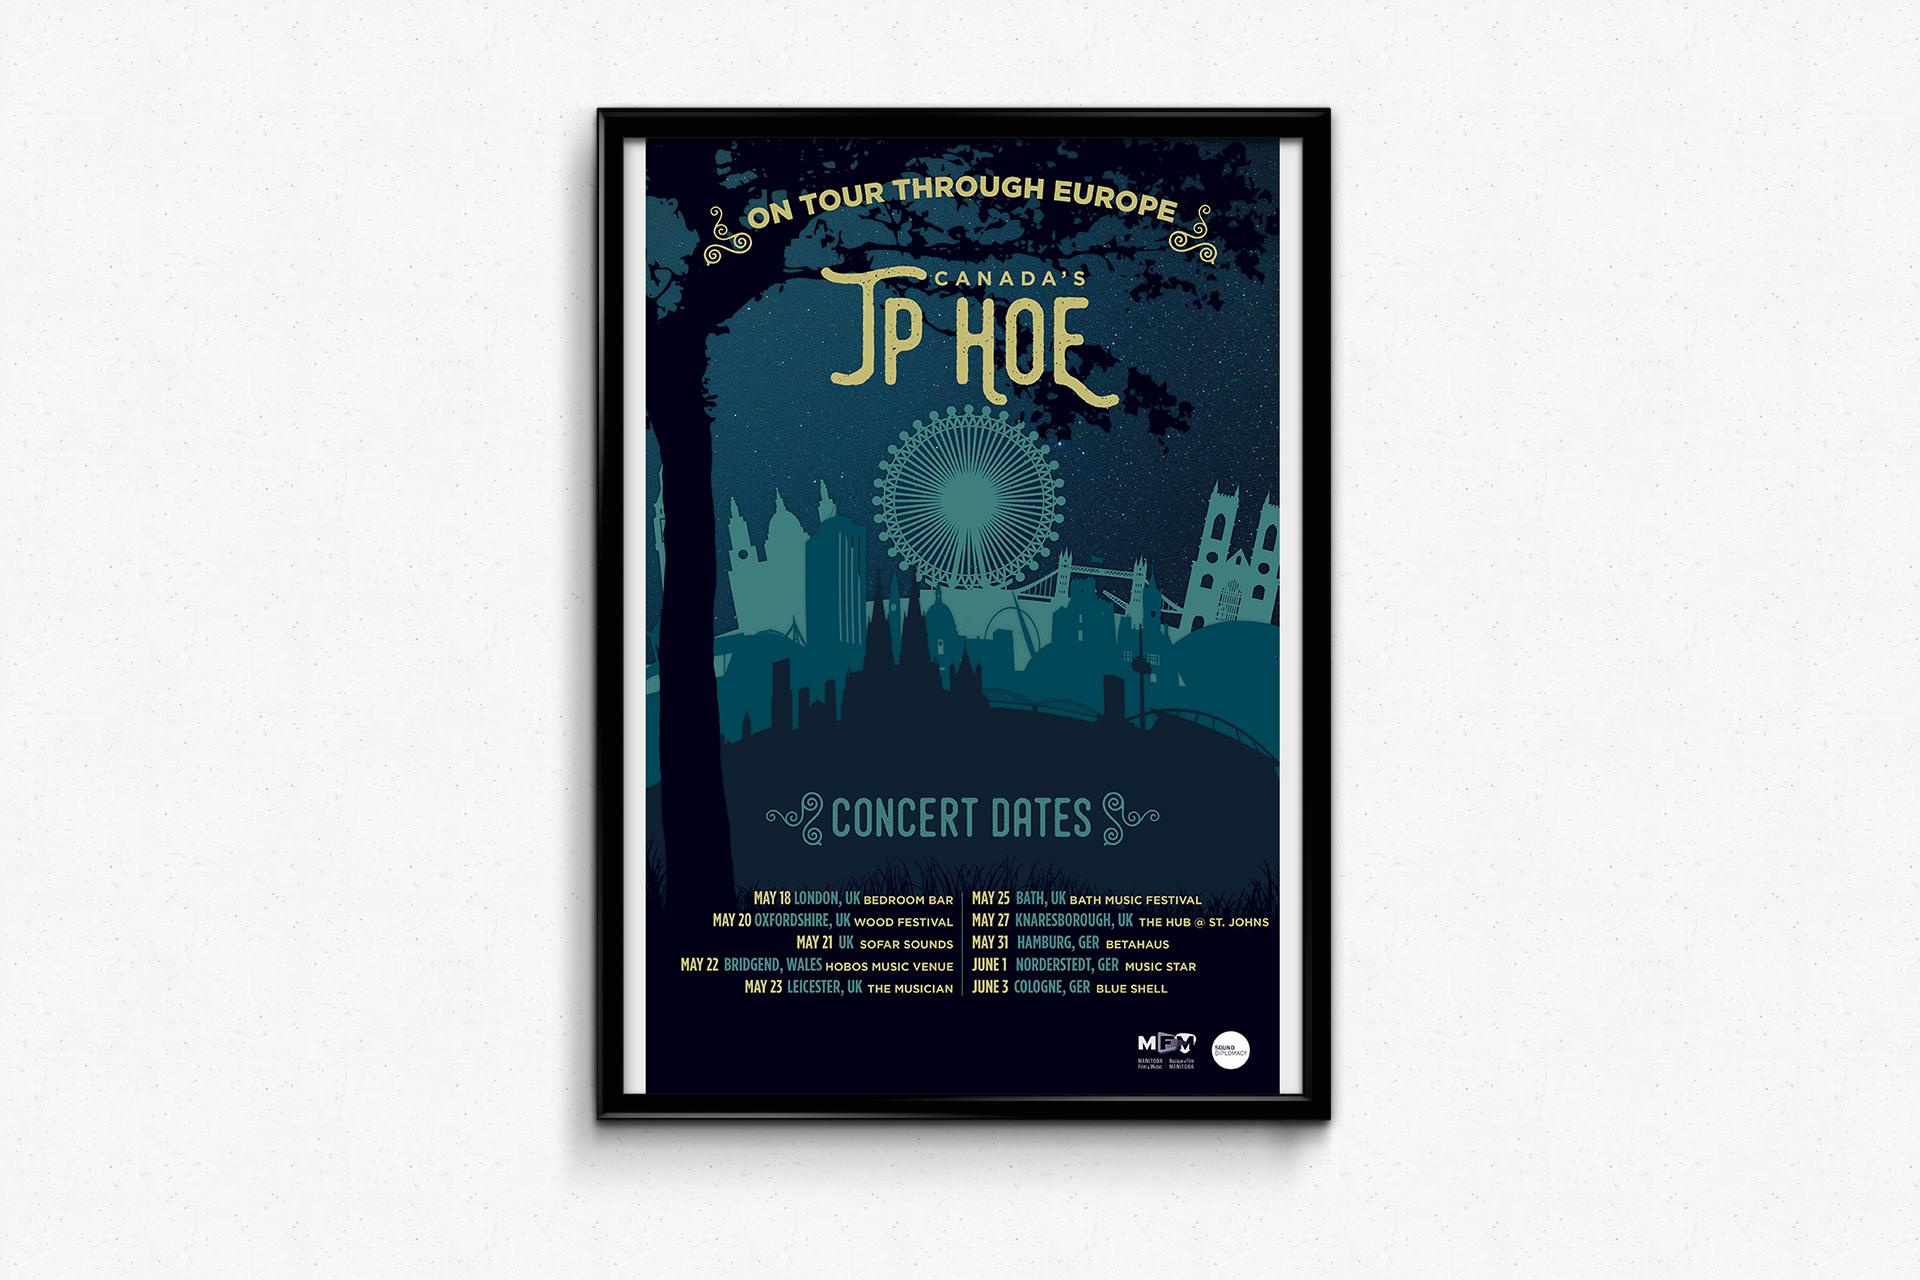 JP Hoe — Tour Through Europe